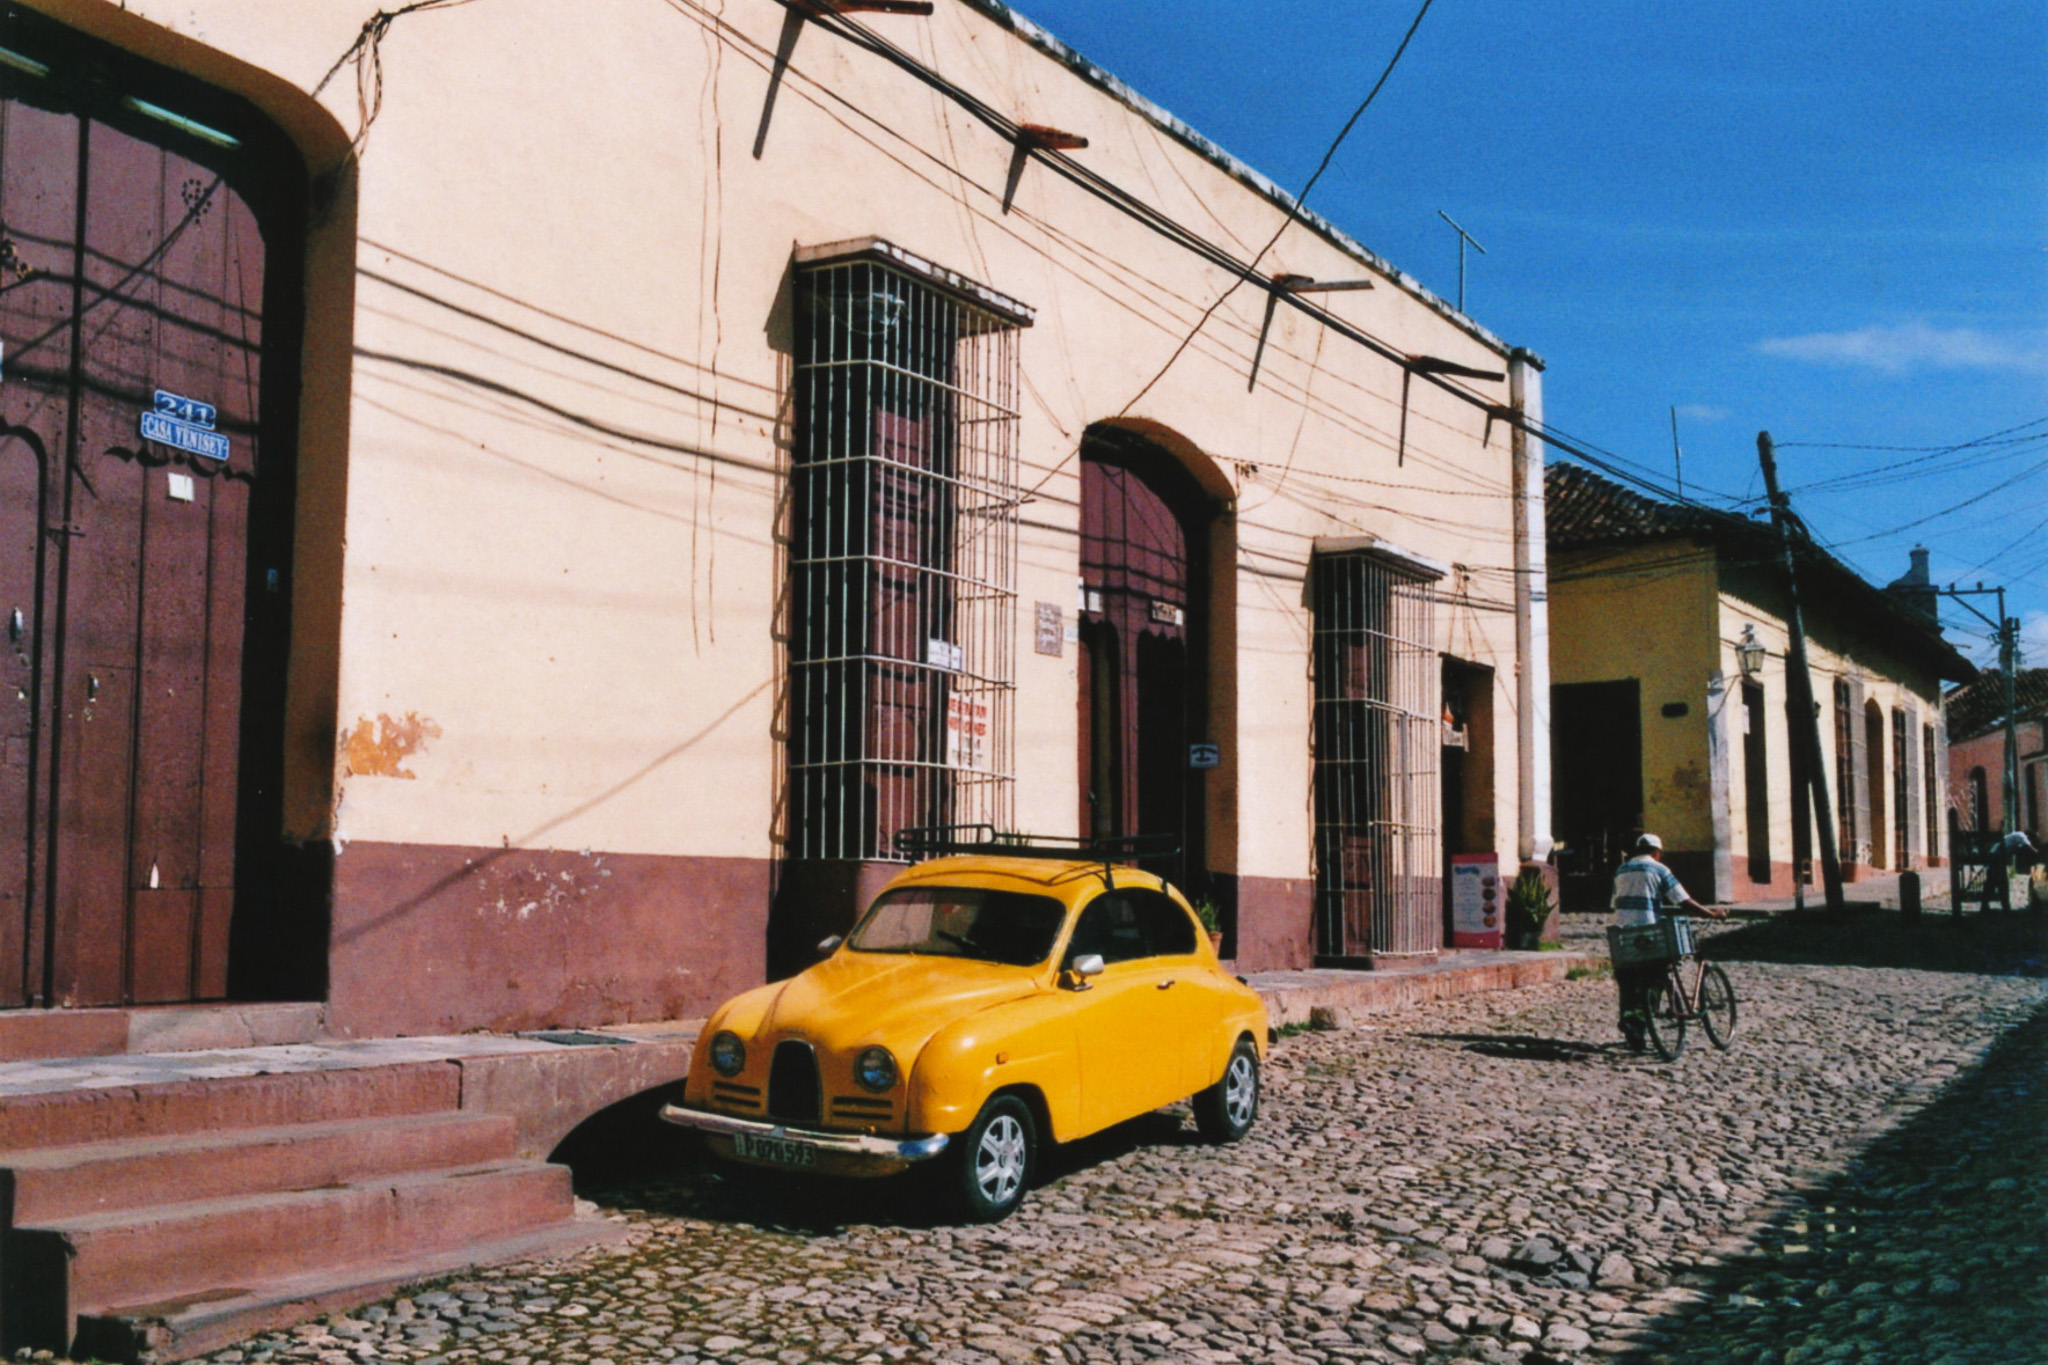 Kuba-2017-12-Analog-111.jpg